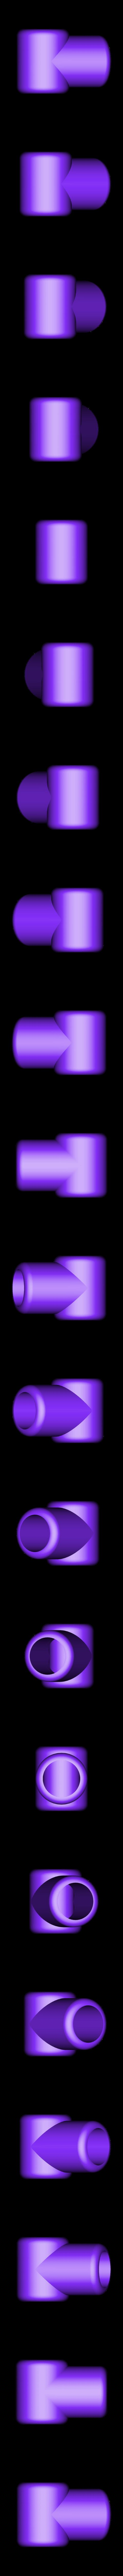 piece_6.stl Download free STL file Picochaise • 3D printer object, PierreR